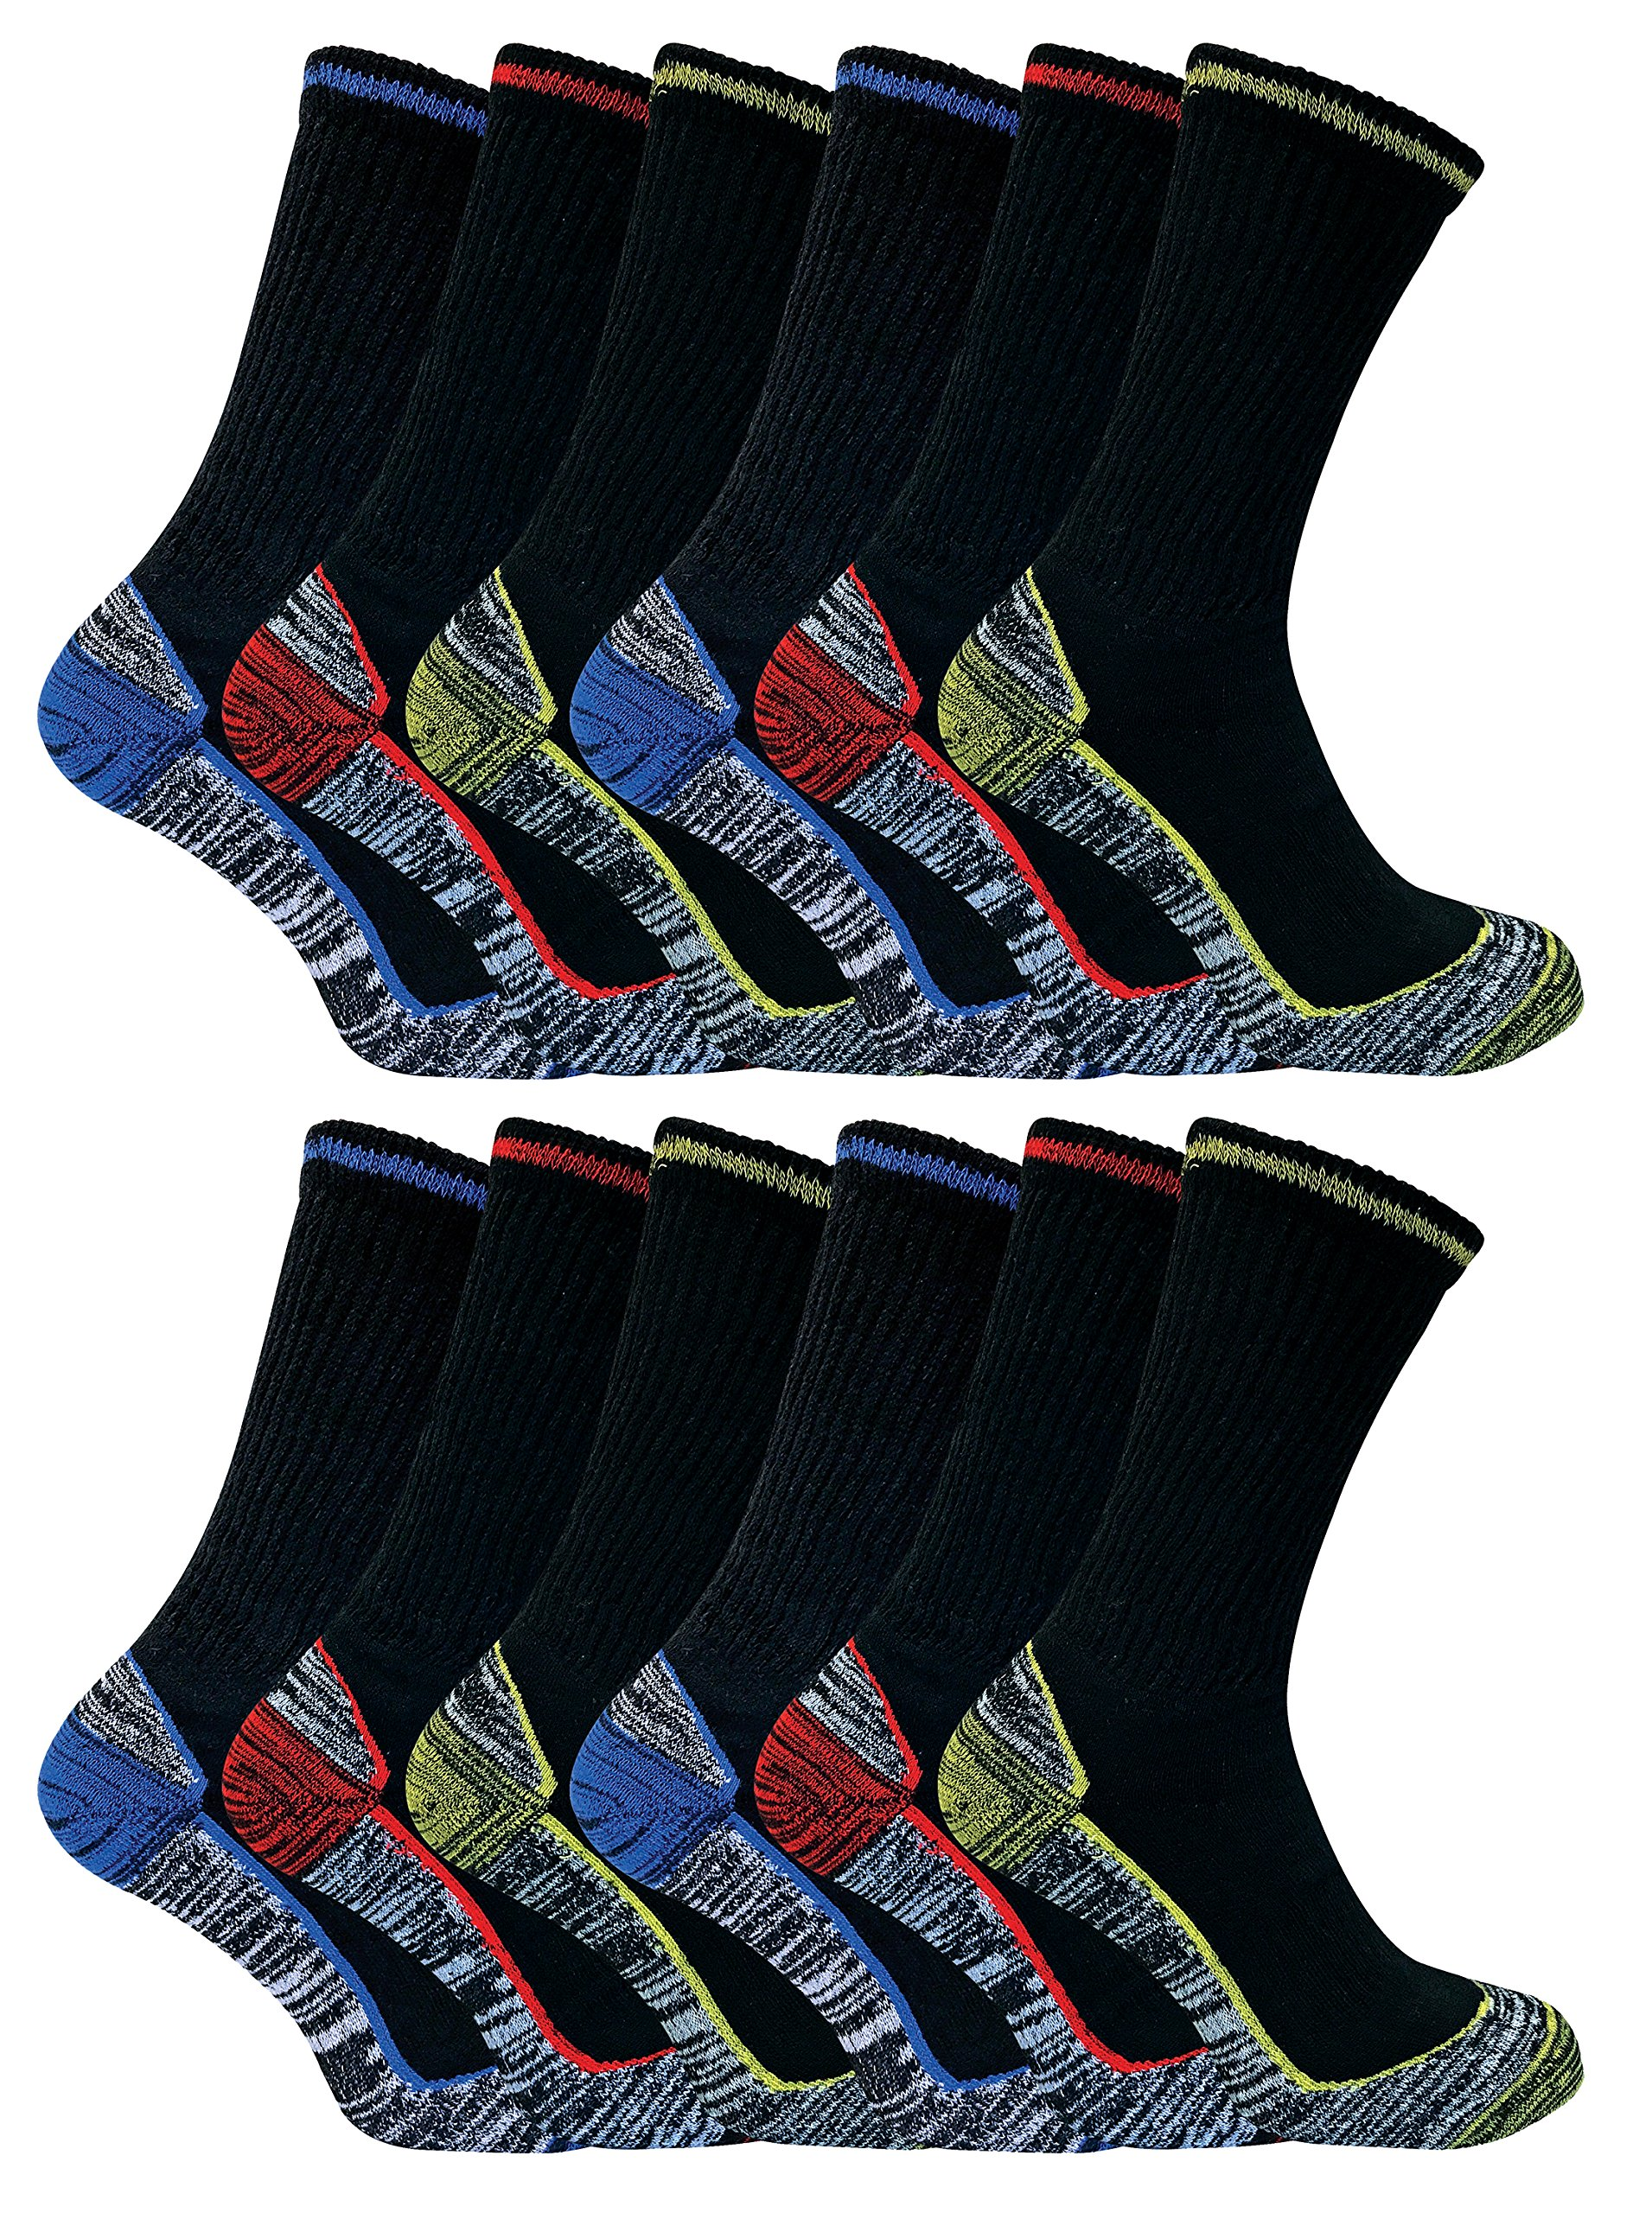 Mens Anti Sweat Moisture Wicking Summer Bamboo Work Socks for Steel Toe Boots (7-12 US, 12 Pack (BWS))